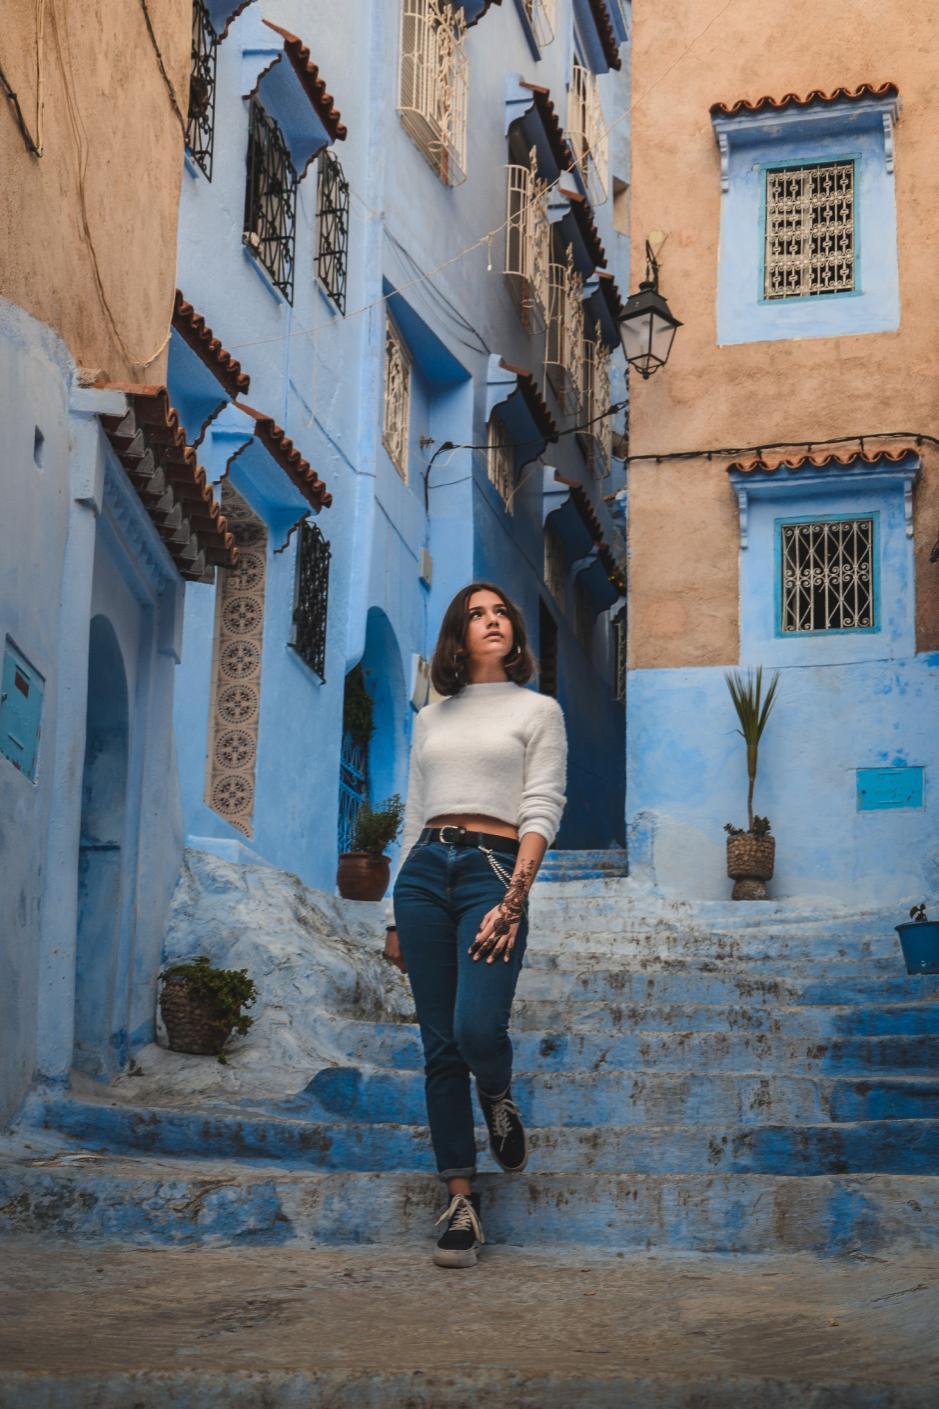 woman-in-white-long-sleeved-shirt-walking-down-stairs-in-2438056.jpg